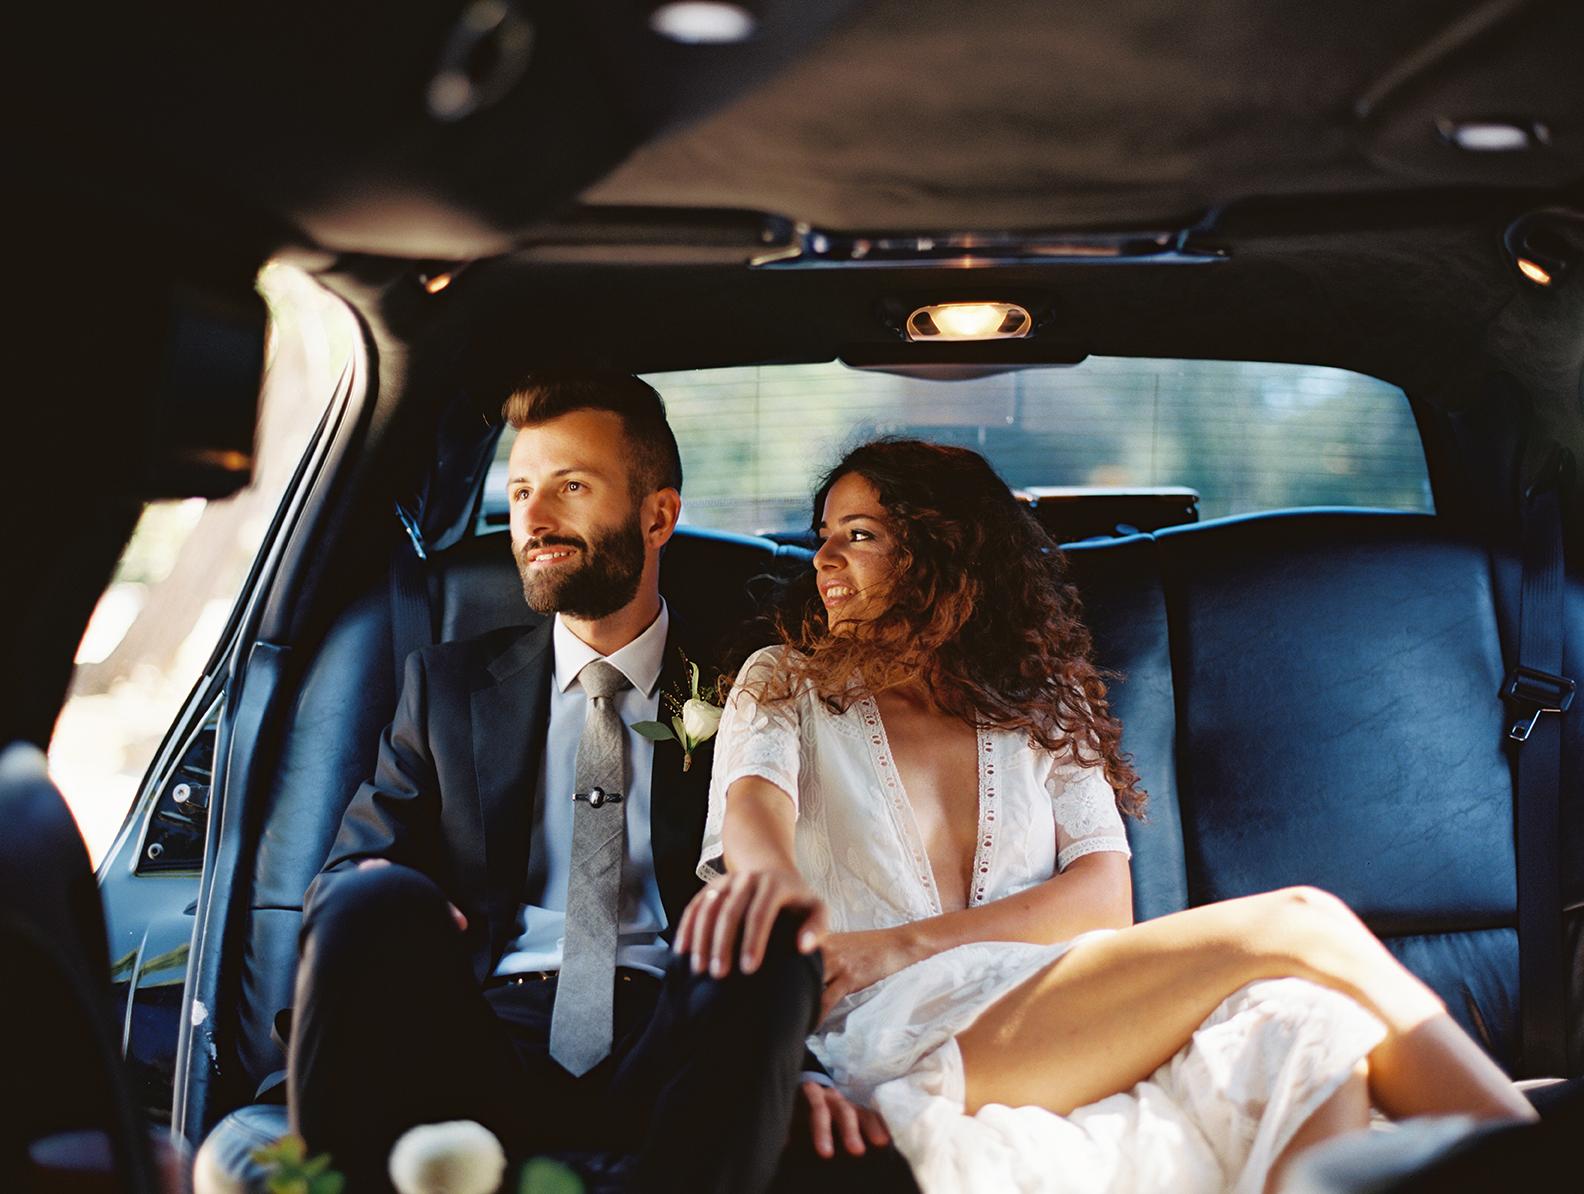 083-brian-sarra-los-angeles-wedding-brumley-wells-photography.jpg